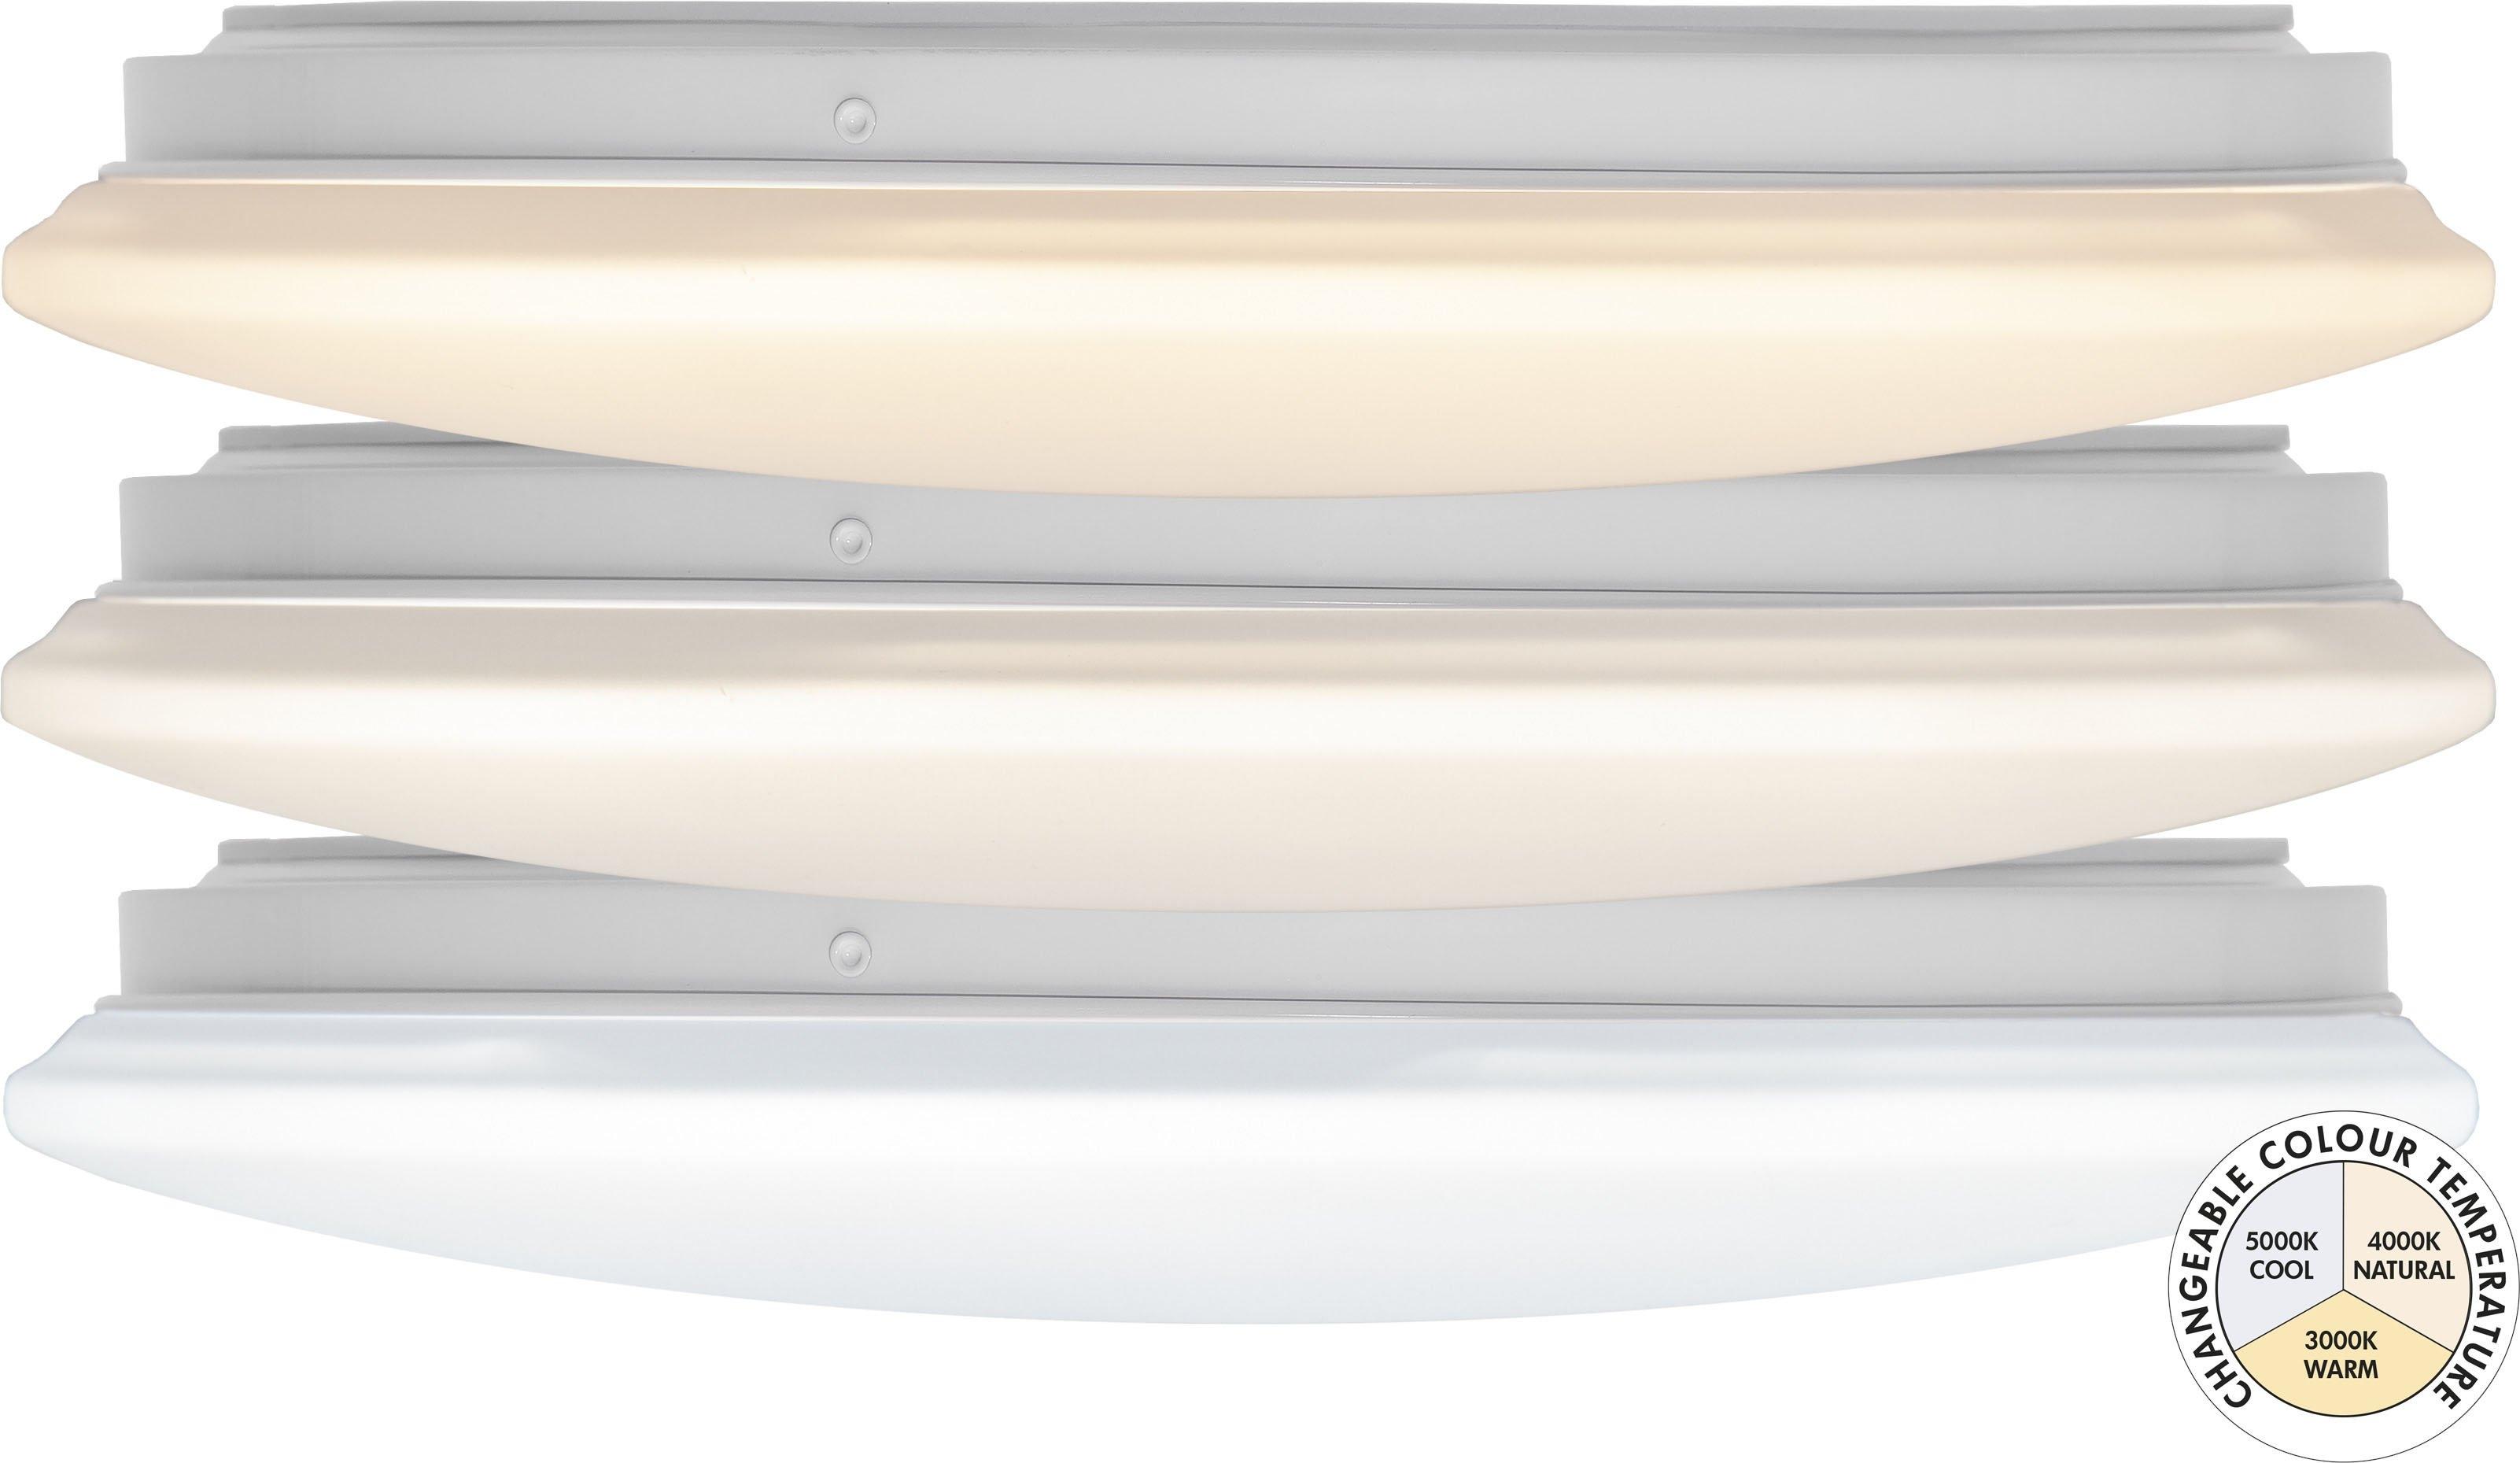 STAR TRADING led-plafondlamp Integra Ceiling in de webshop van OTTO kopen